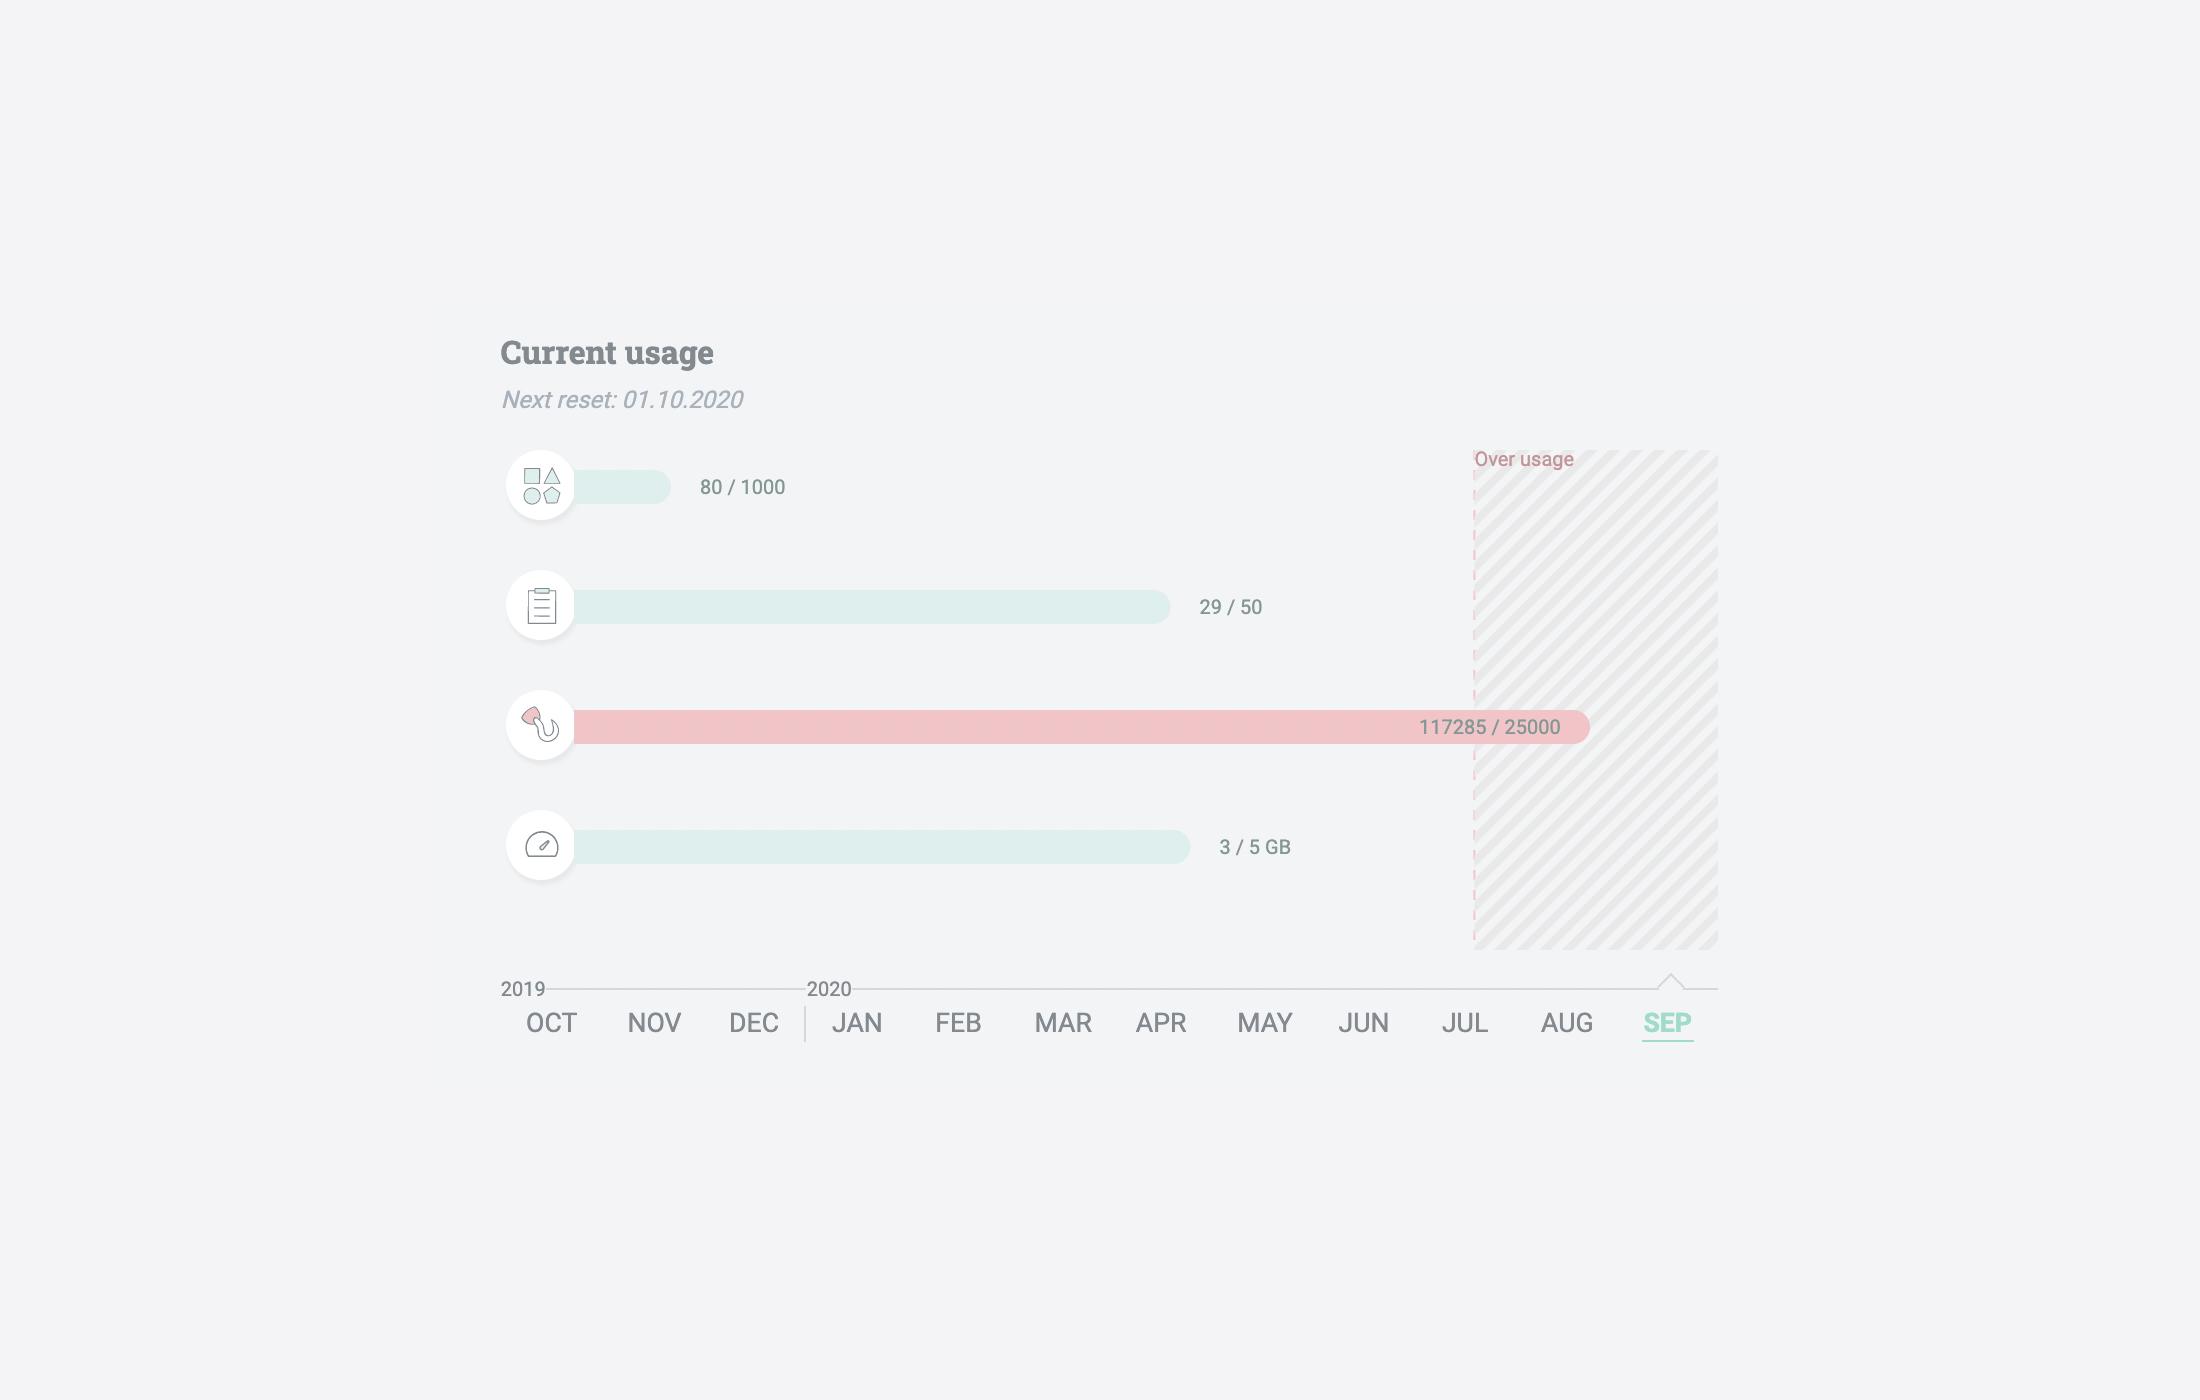 Current usage metrics